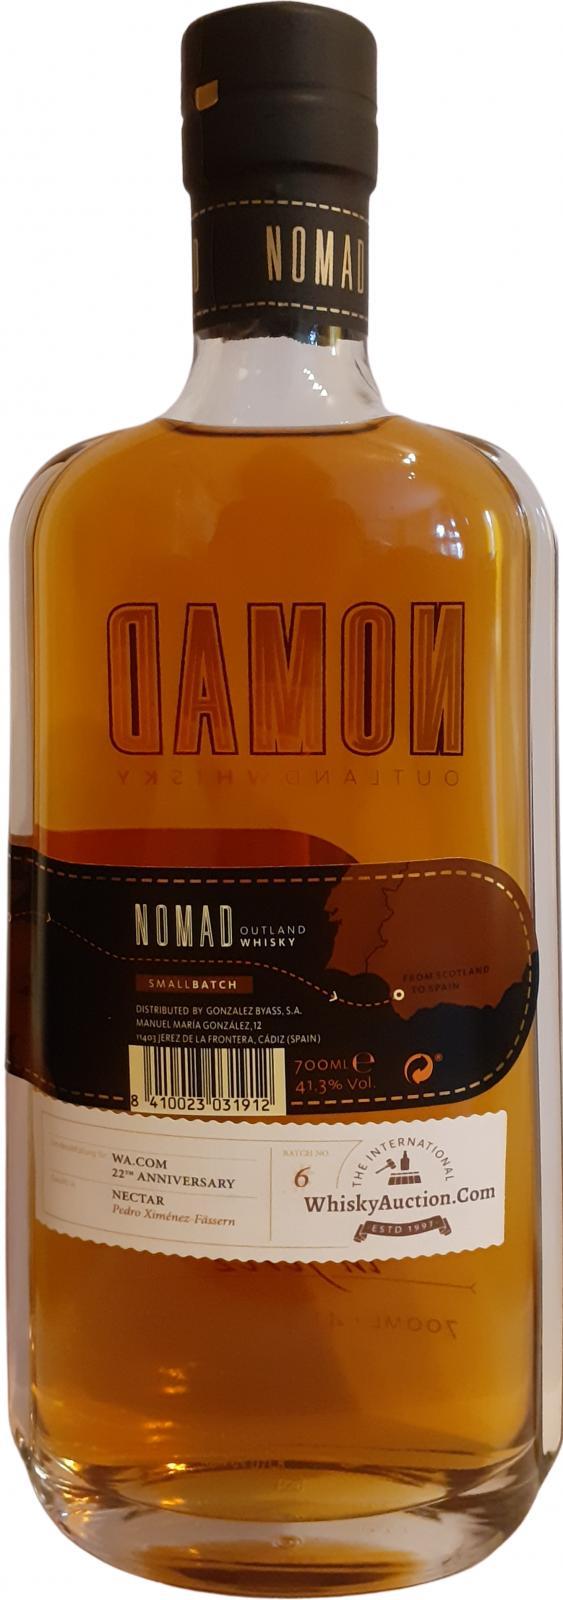 Nomad Outland Whisky